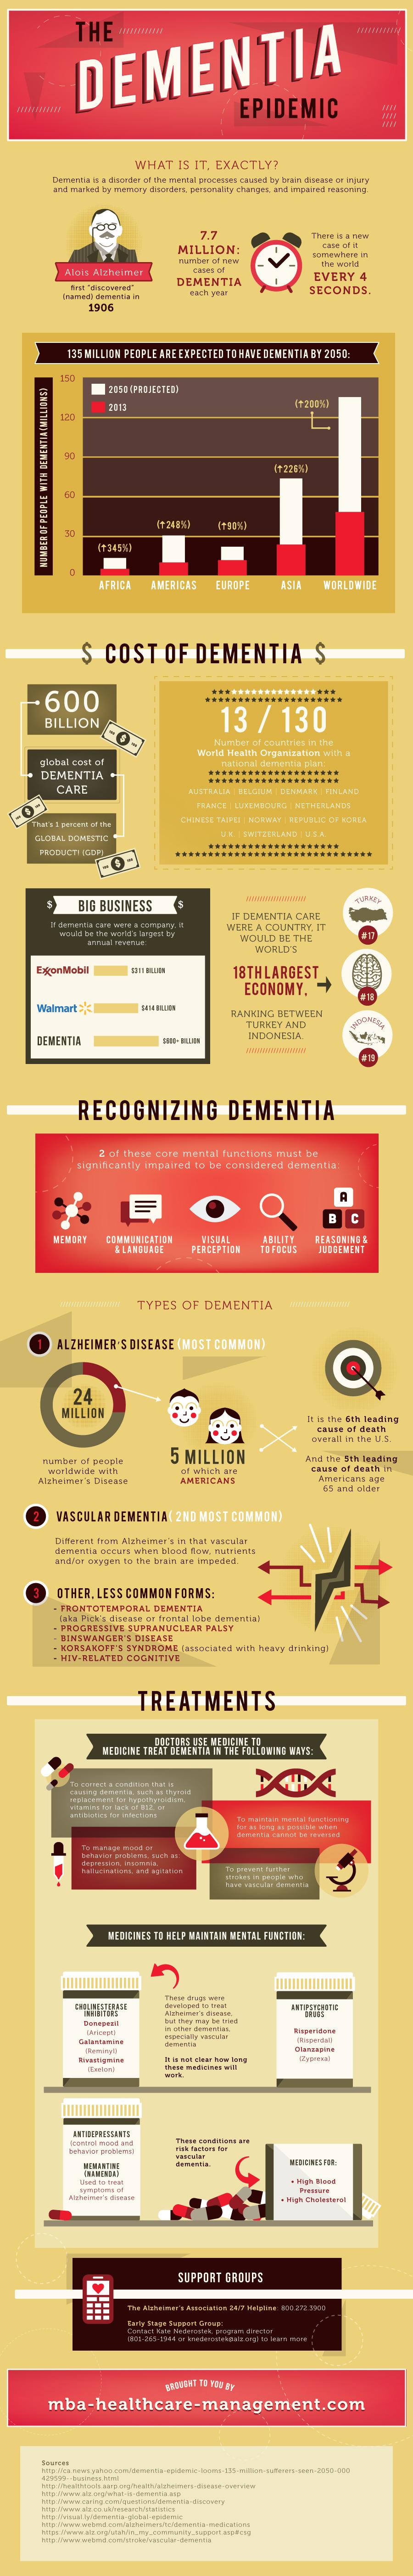 The Dementia Epidemic